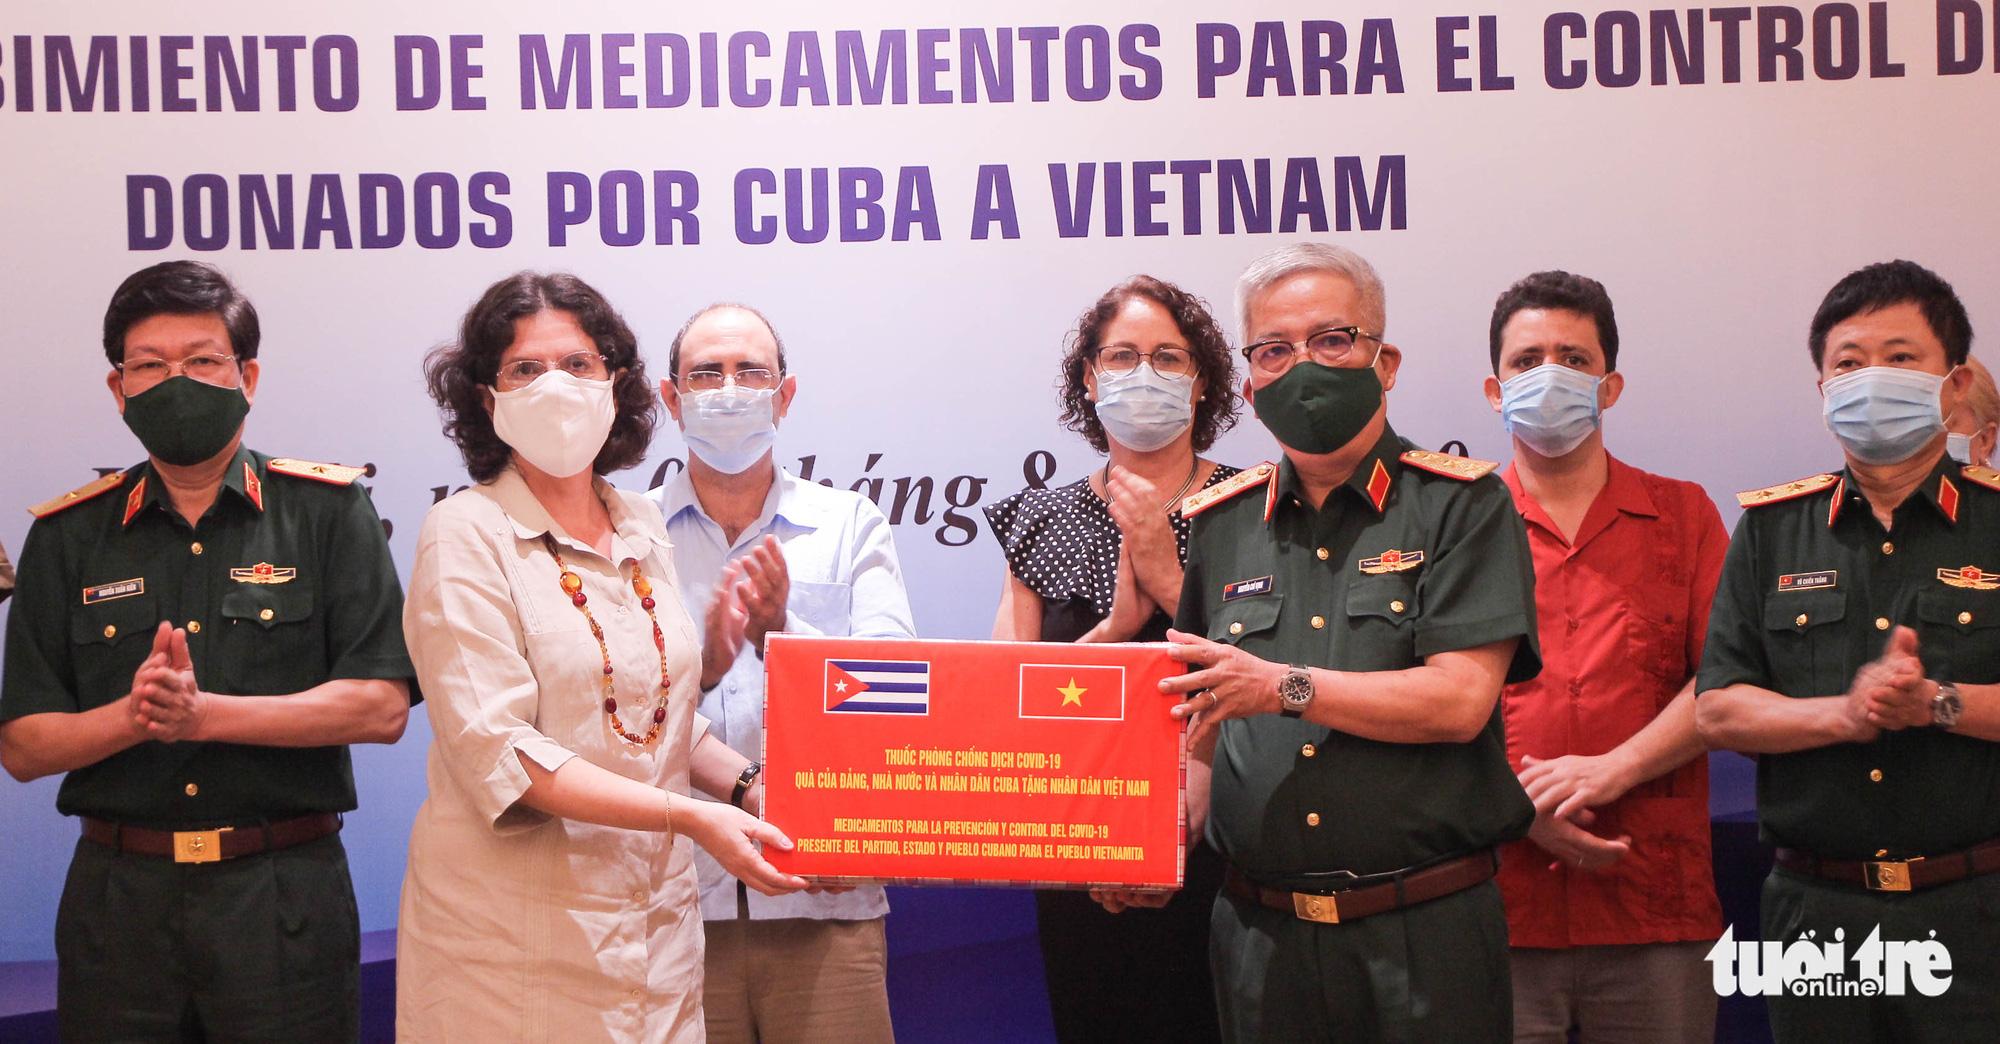 Cuba sends medicine, health experts to Vietnam for COVID-19 fight